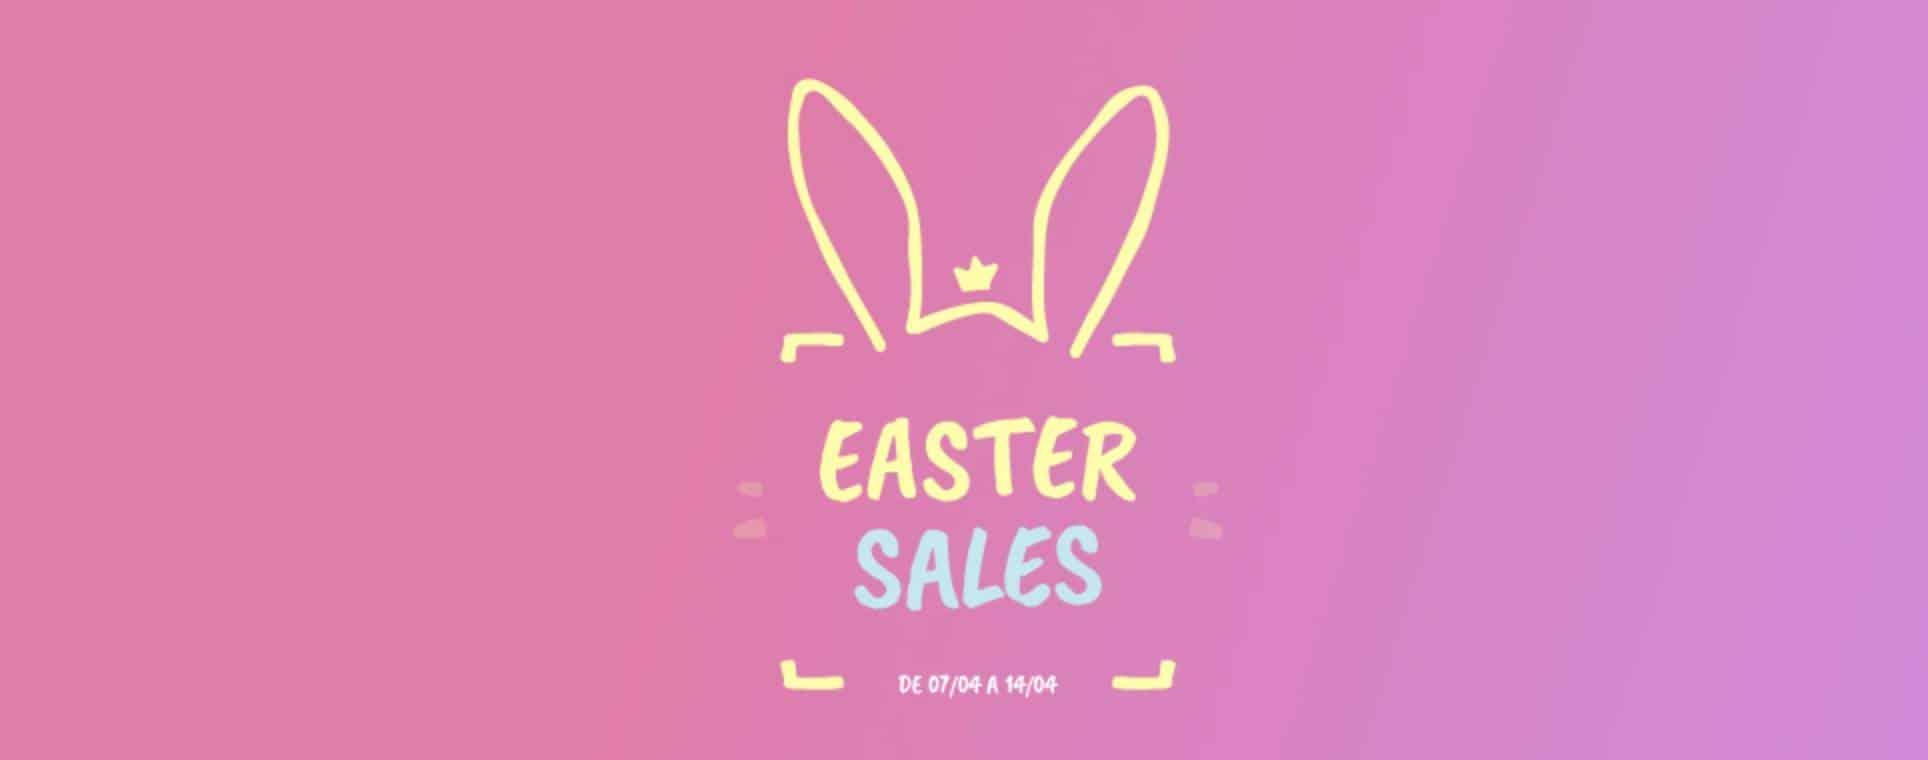 Easter Sales